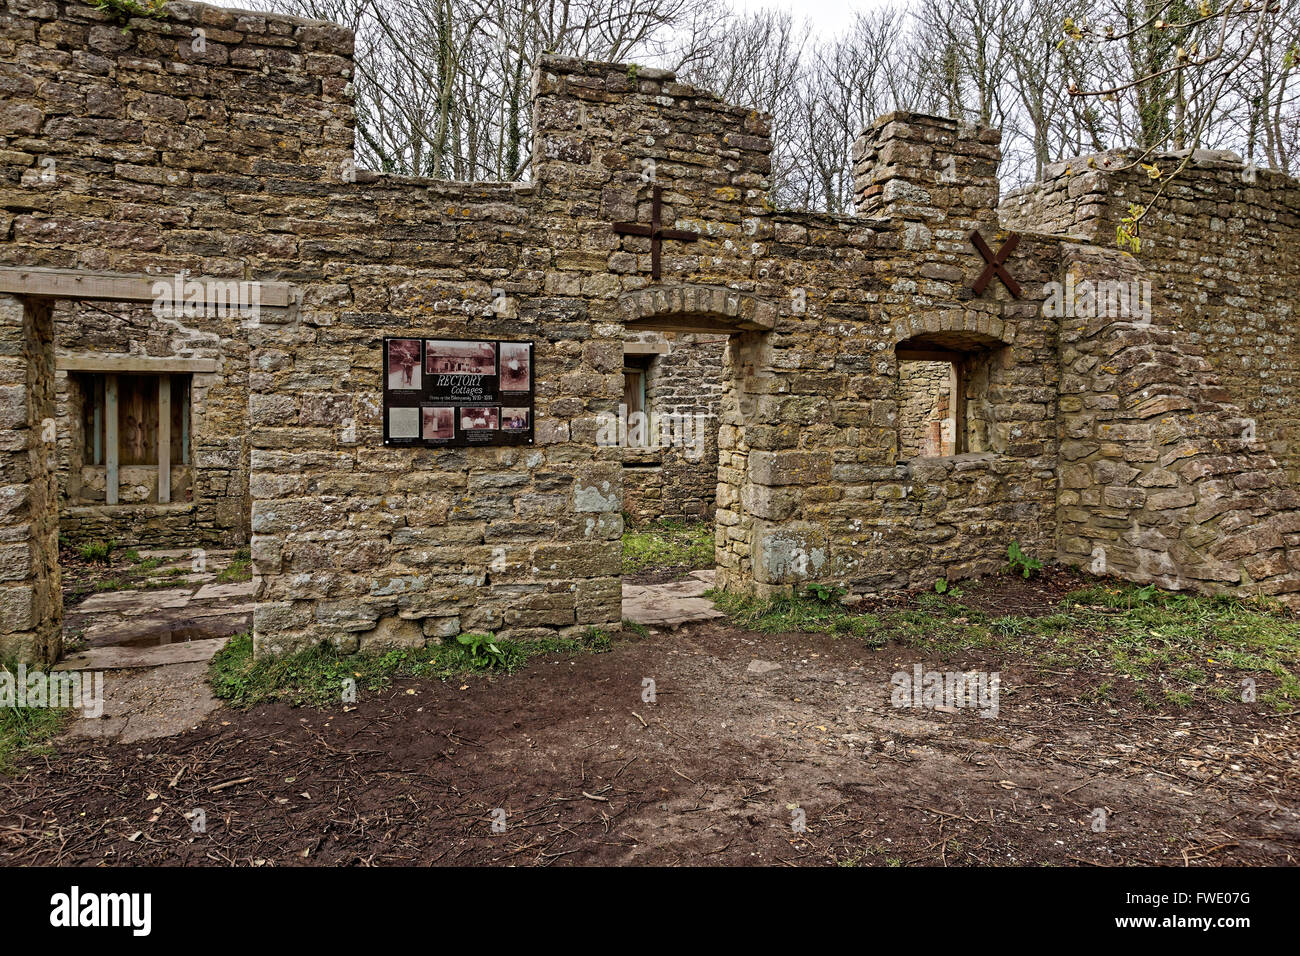 shepherd's house and post office in Tyneham. - Stock Image